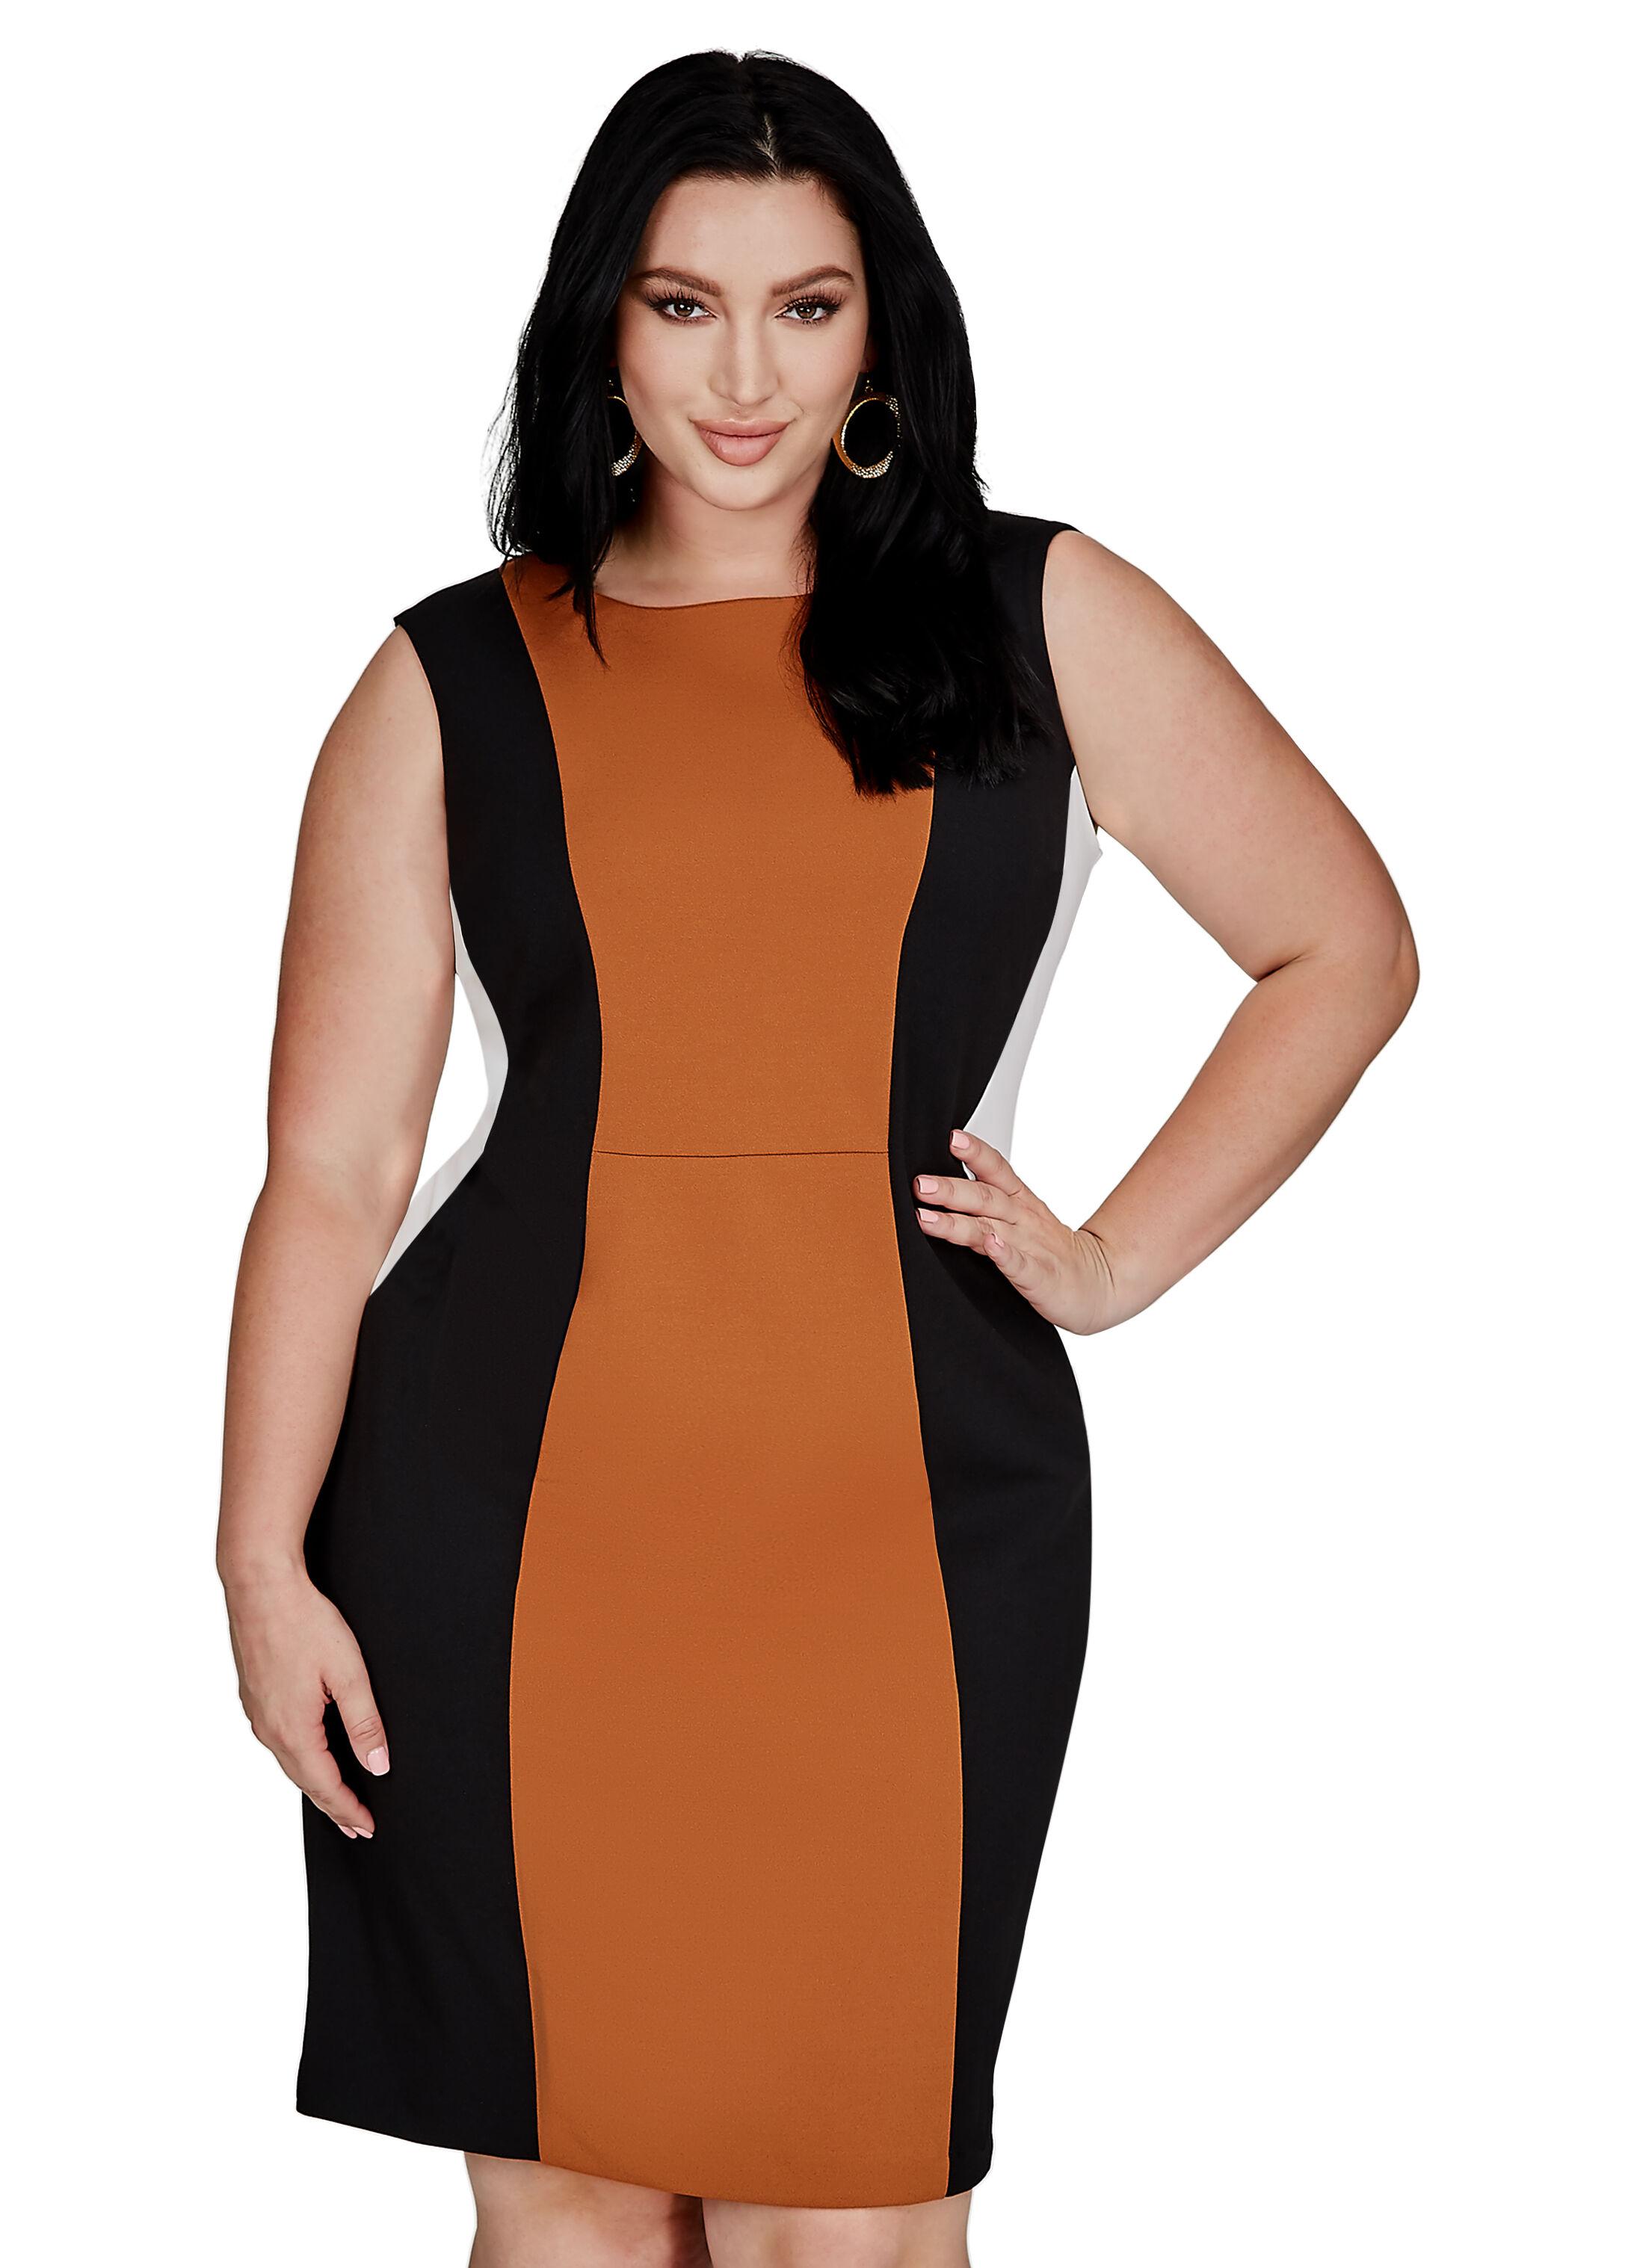 Tri-Tone Colorblock Sheath Dress